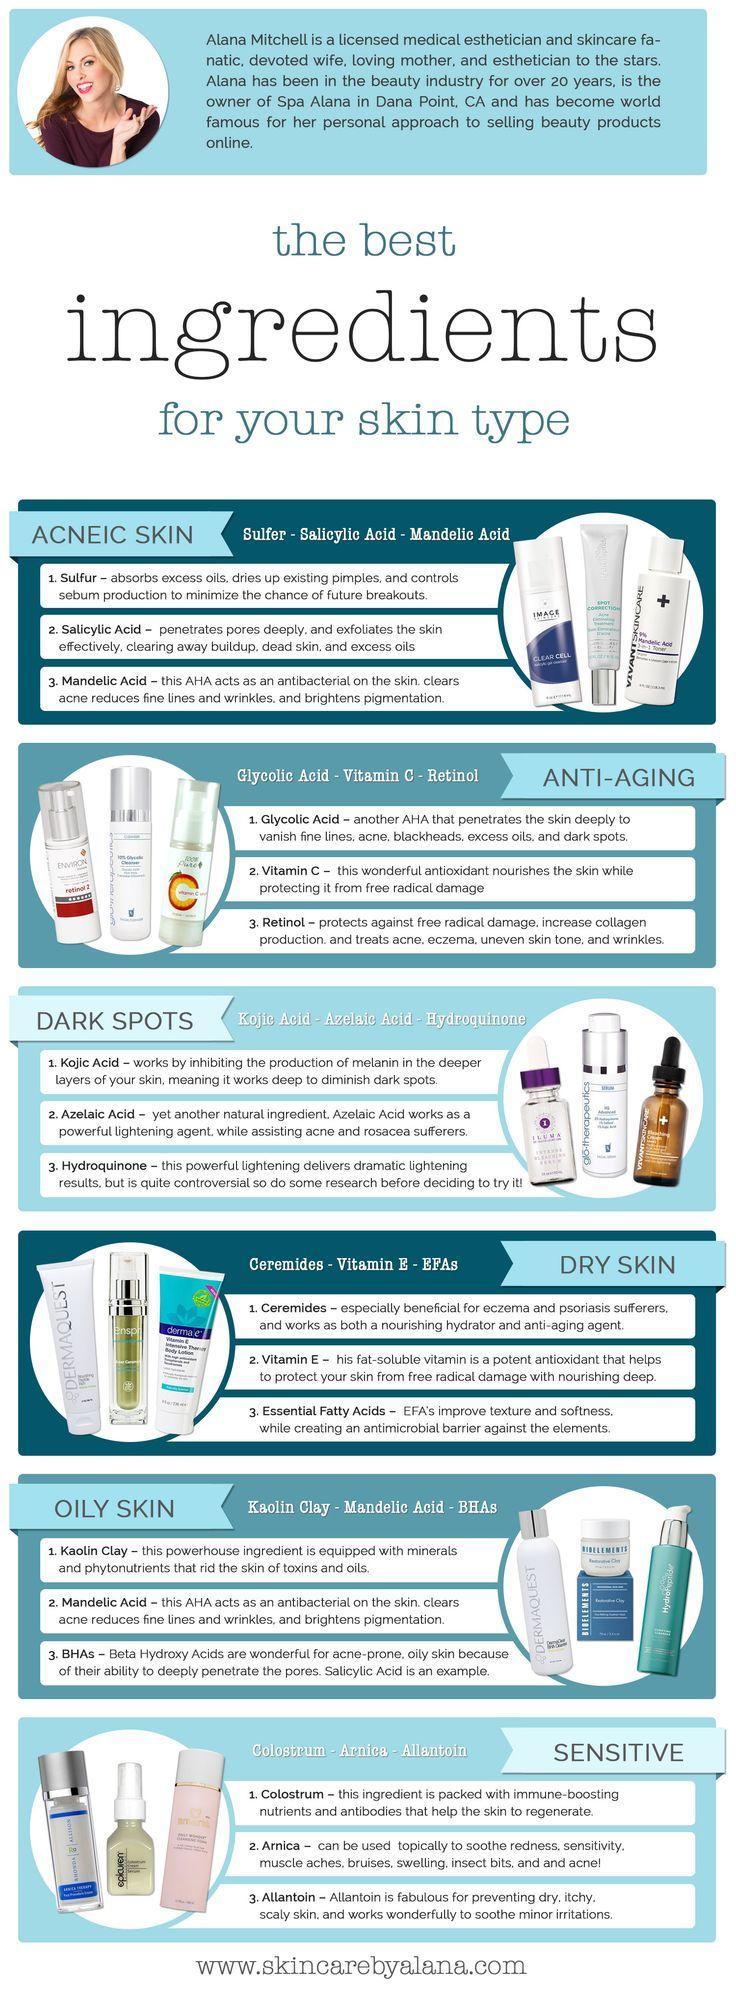 Design Bank 2 Zits Lugo.111 Best Acne Prone Skin Images Acne Prone Skin Skin Care Makeup